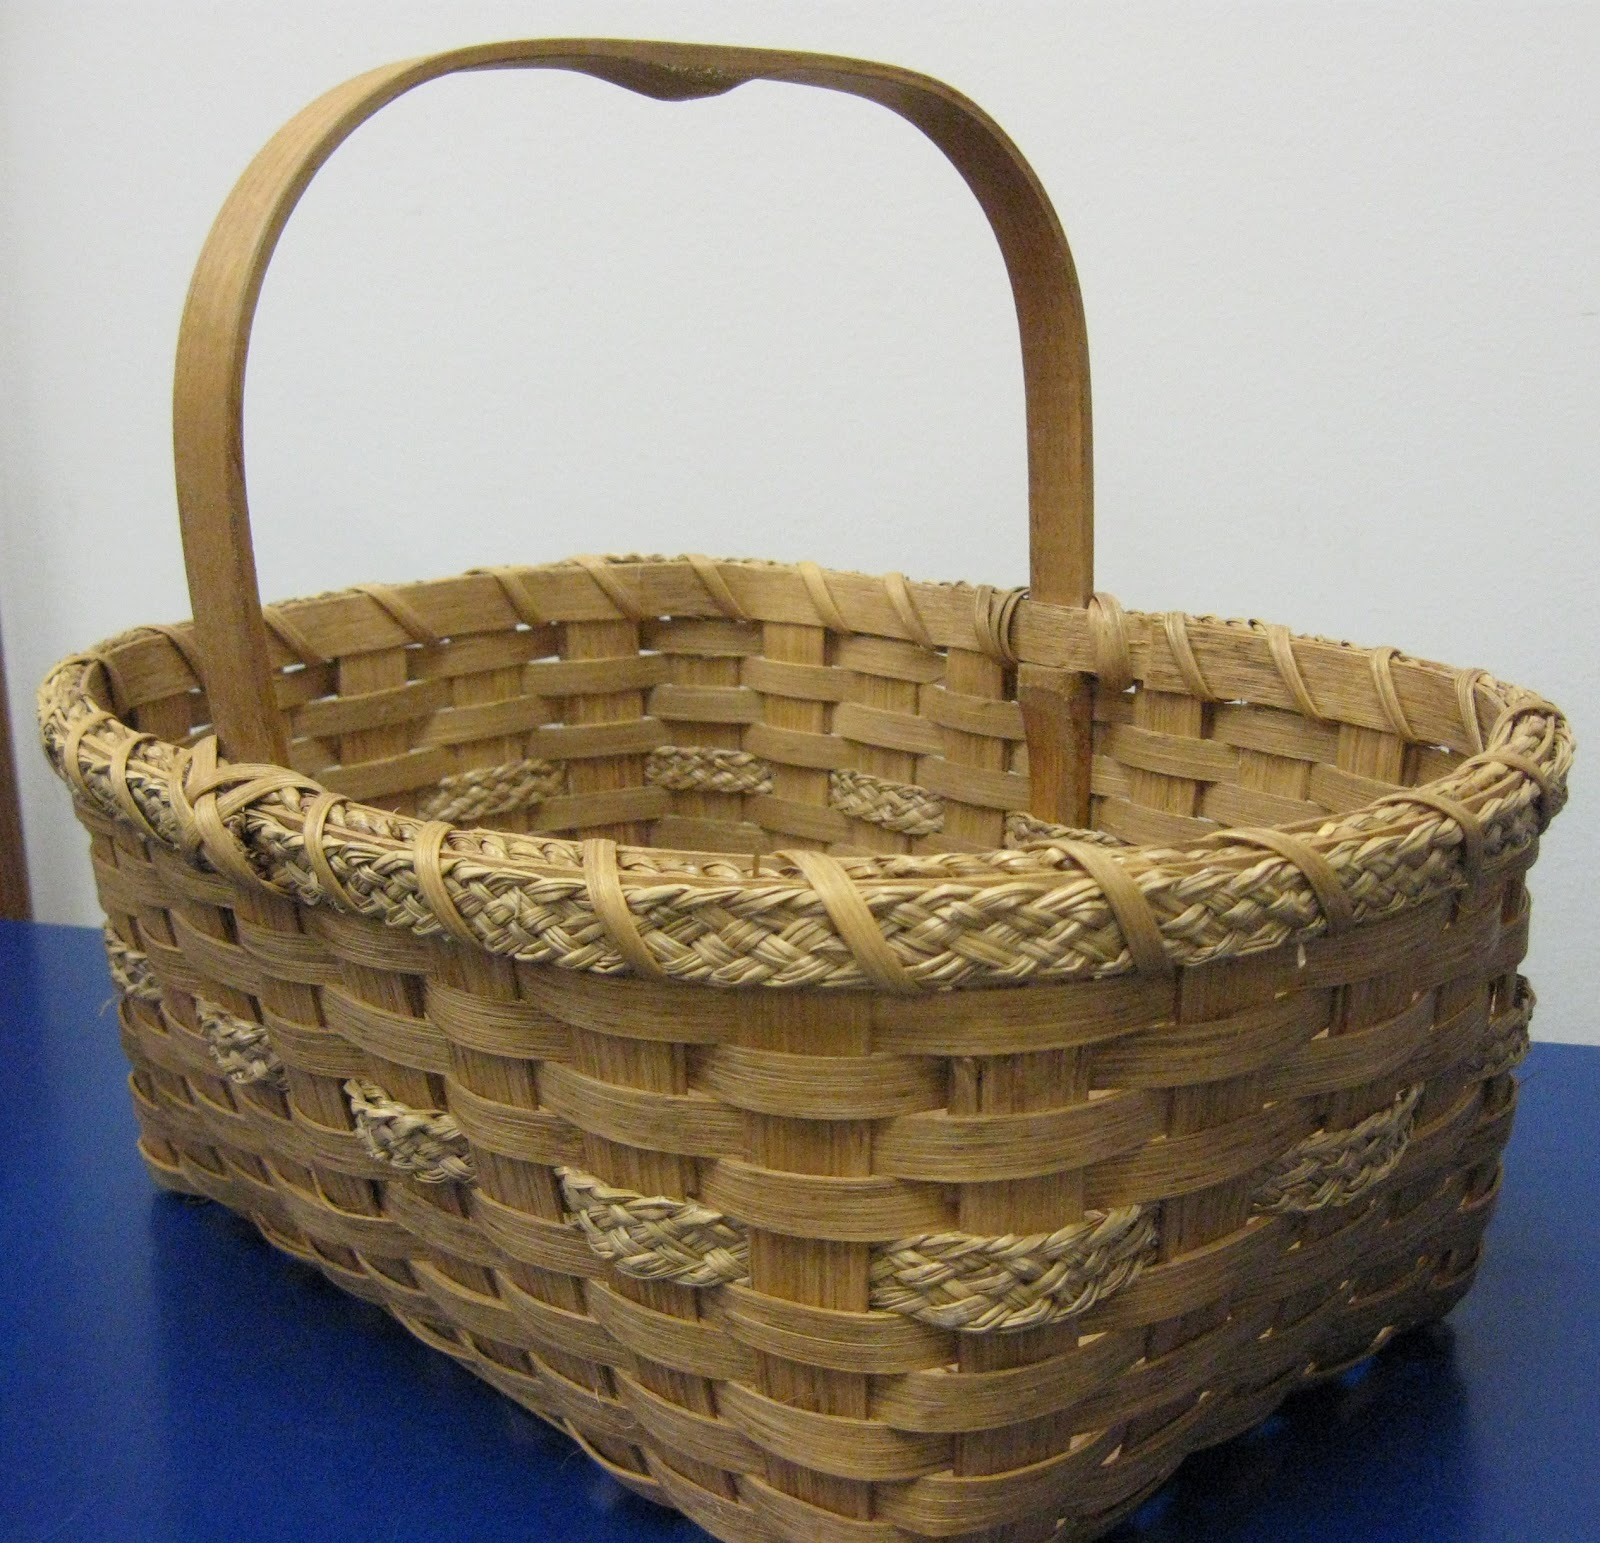 Basket Weaving Name : Carnegie public library of steuben county basket weaving